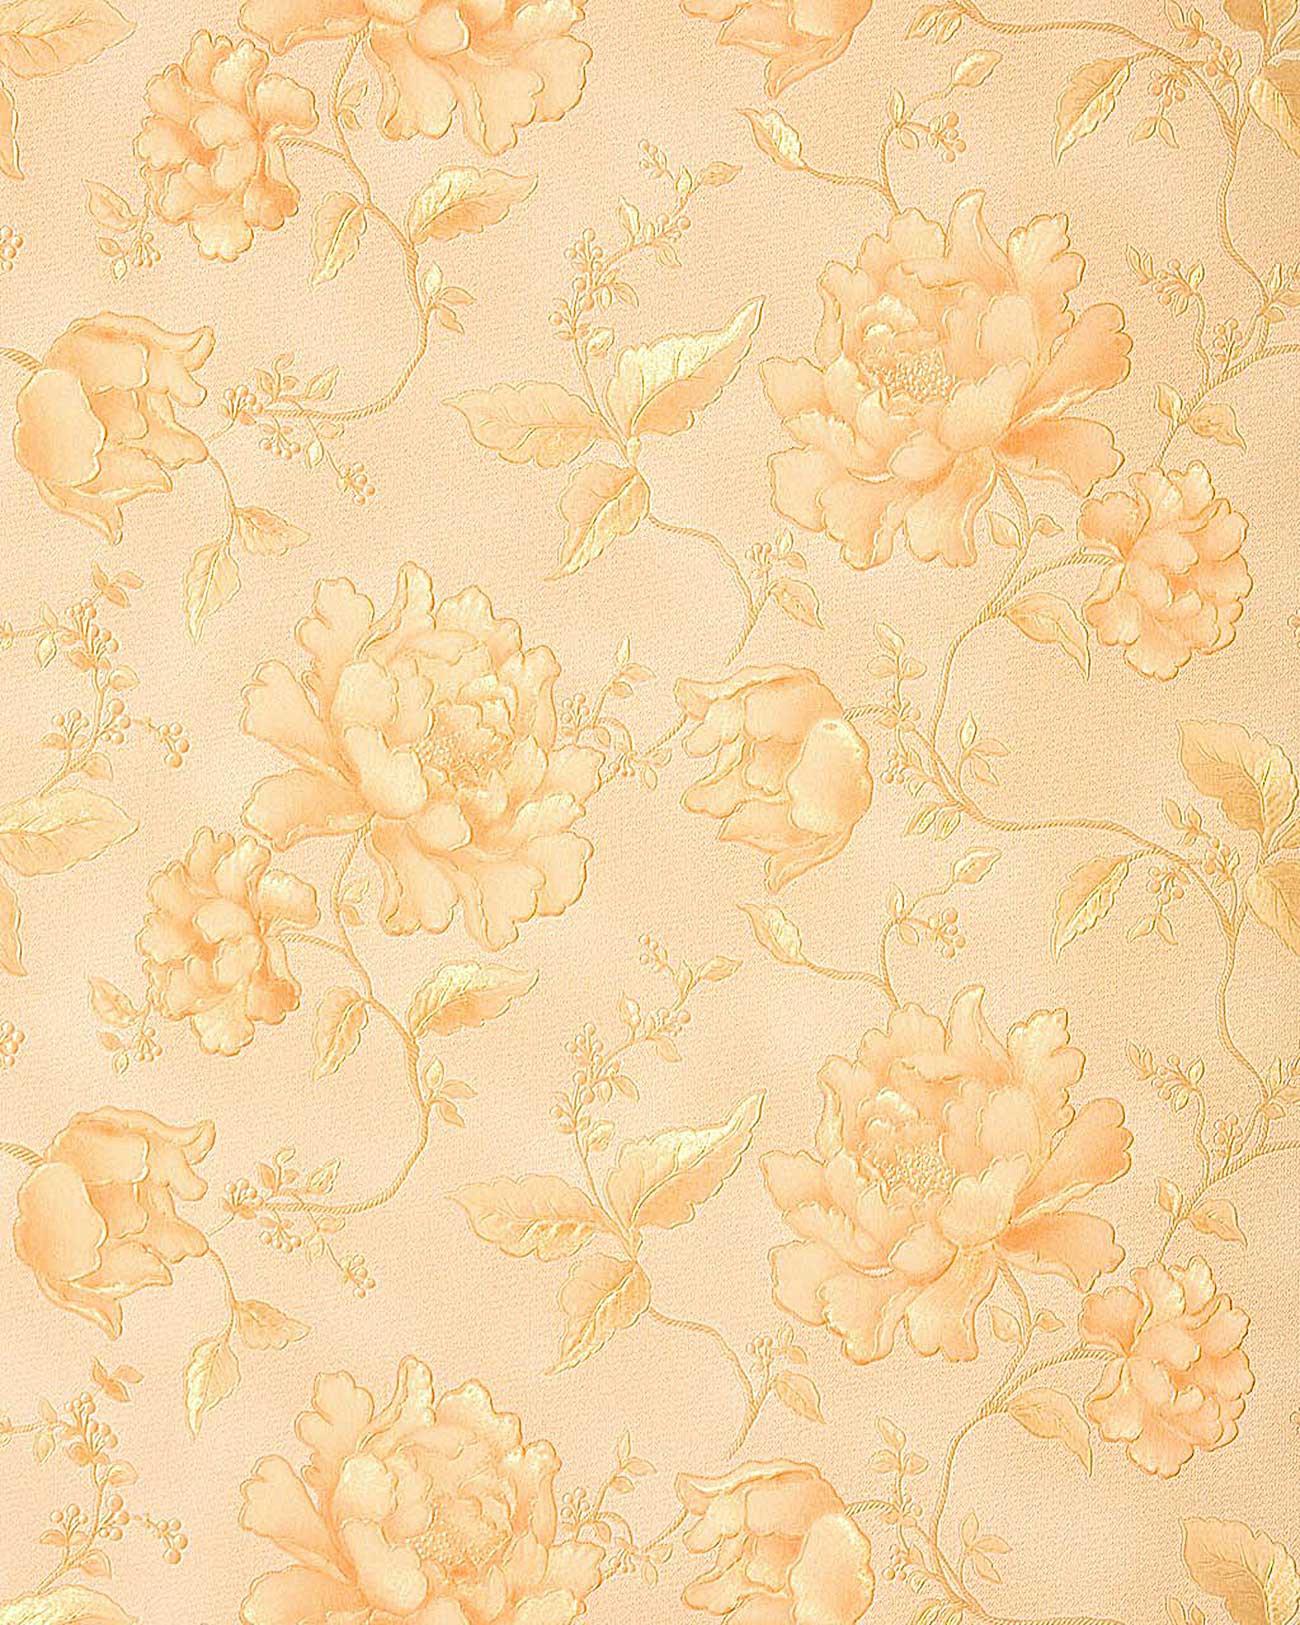 Edem 748 32 luxus floral tapete pr ge 3d blumentapete for 3d tapete gold